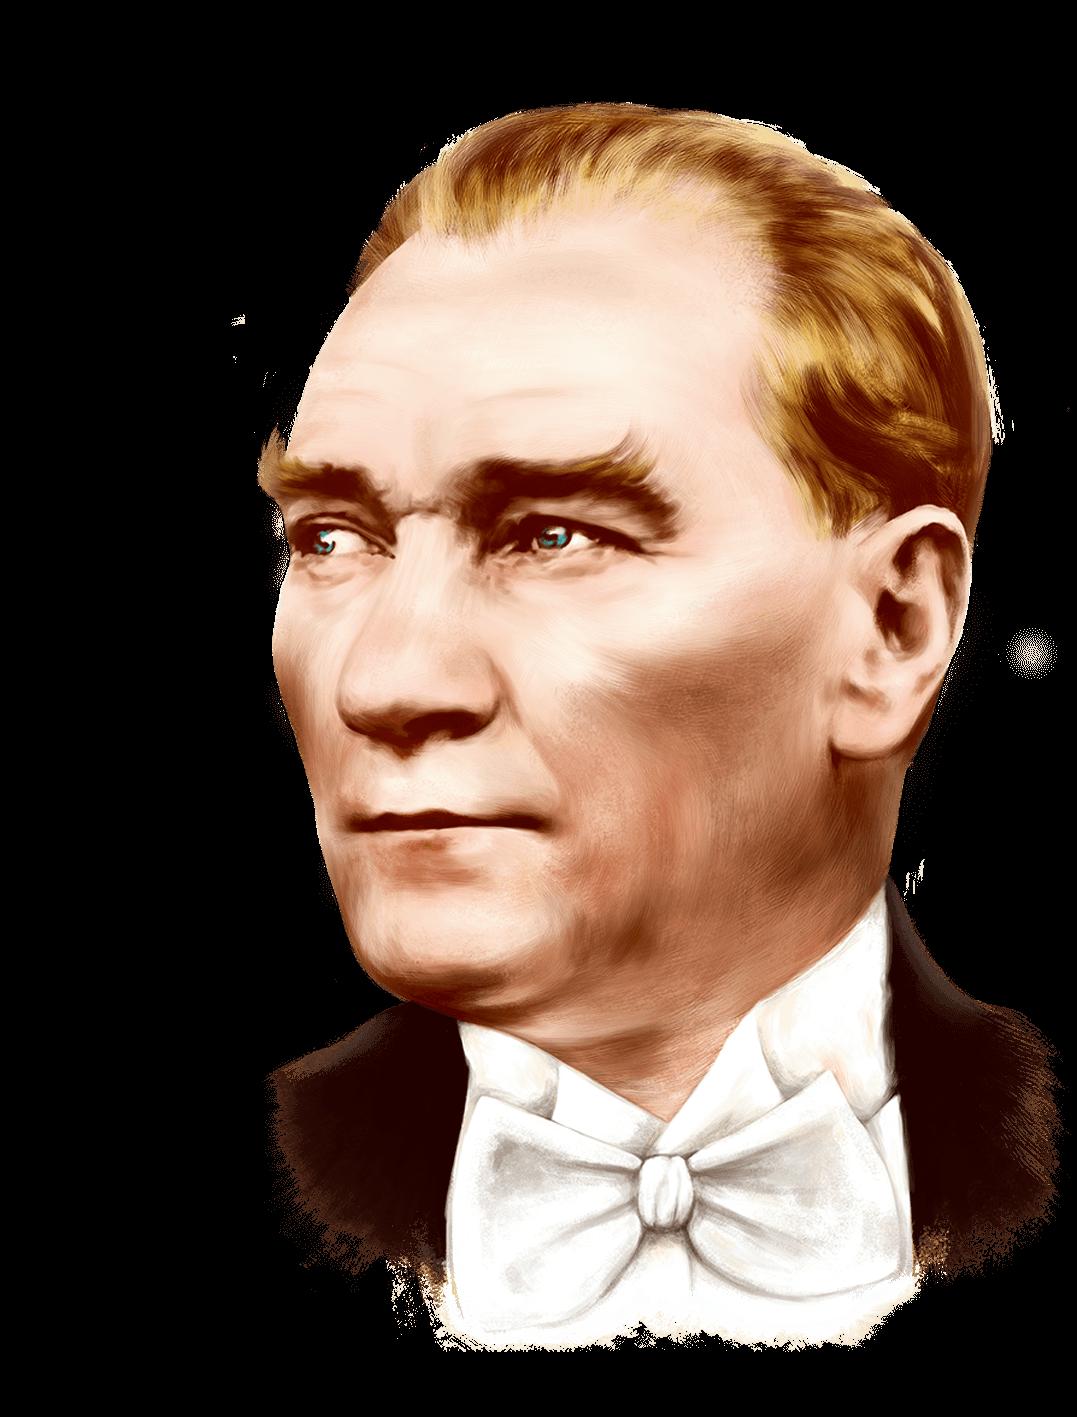 The photo gallery of Mustafa Kemal Atatürk, Best pictures of Mustafa Kemal  Atatürk. - Ataturk 03 PNG